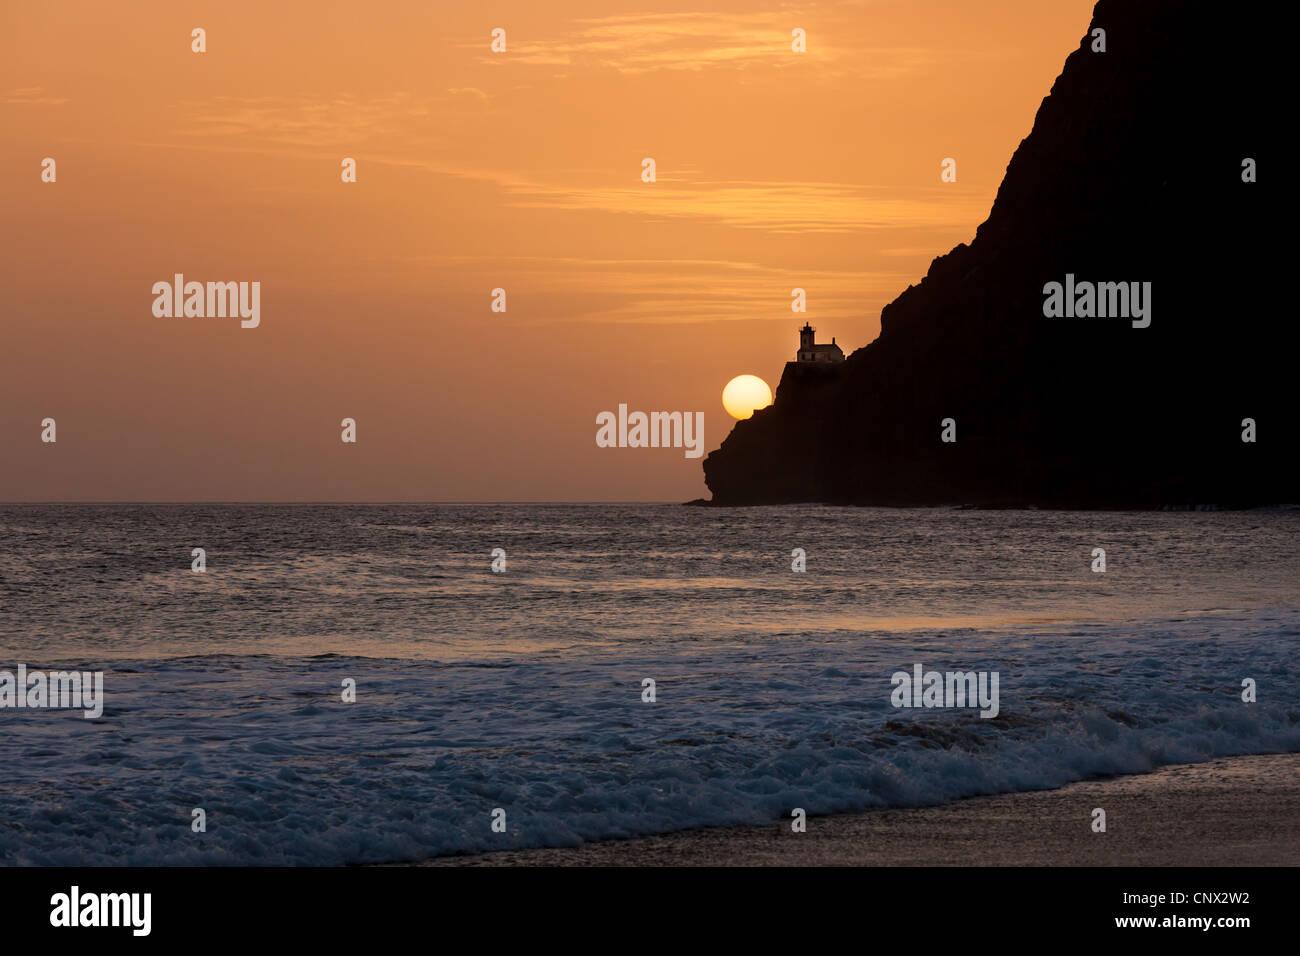 Sunset from a beach on São Vicente, Cape Verde Stock Photo